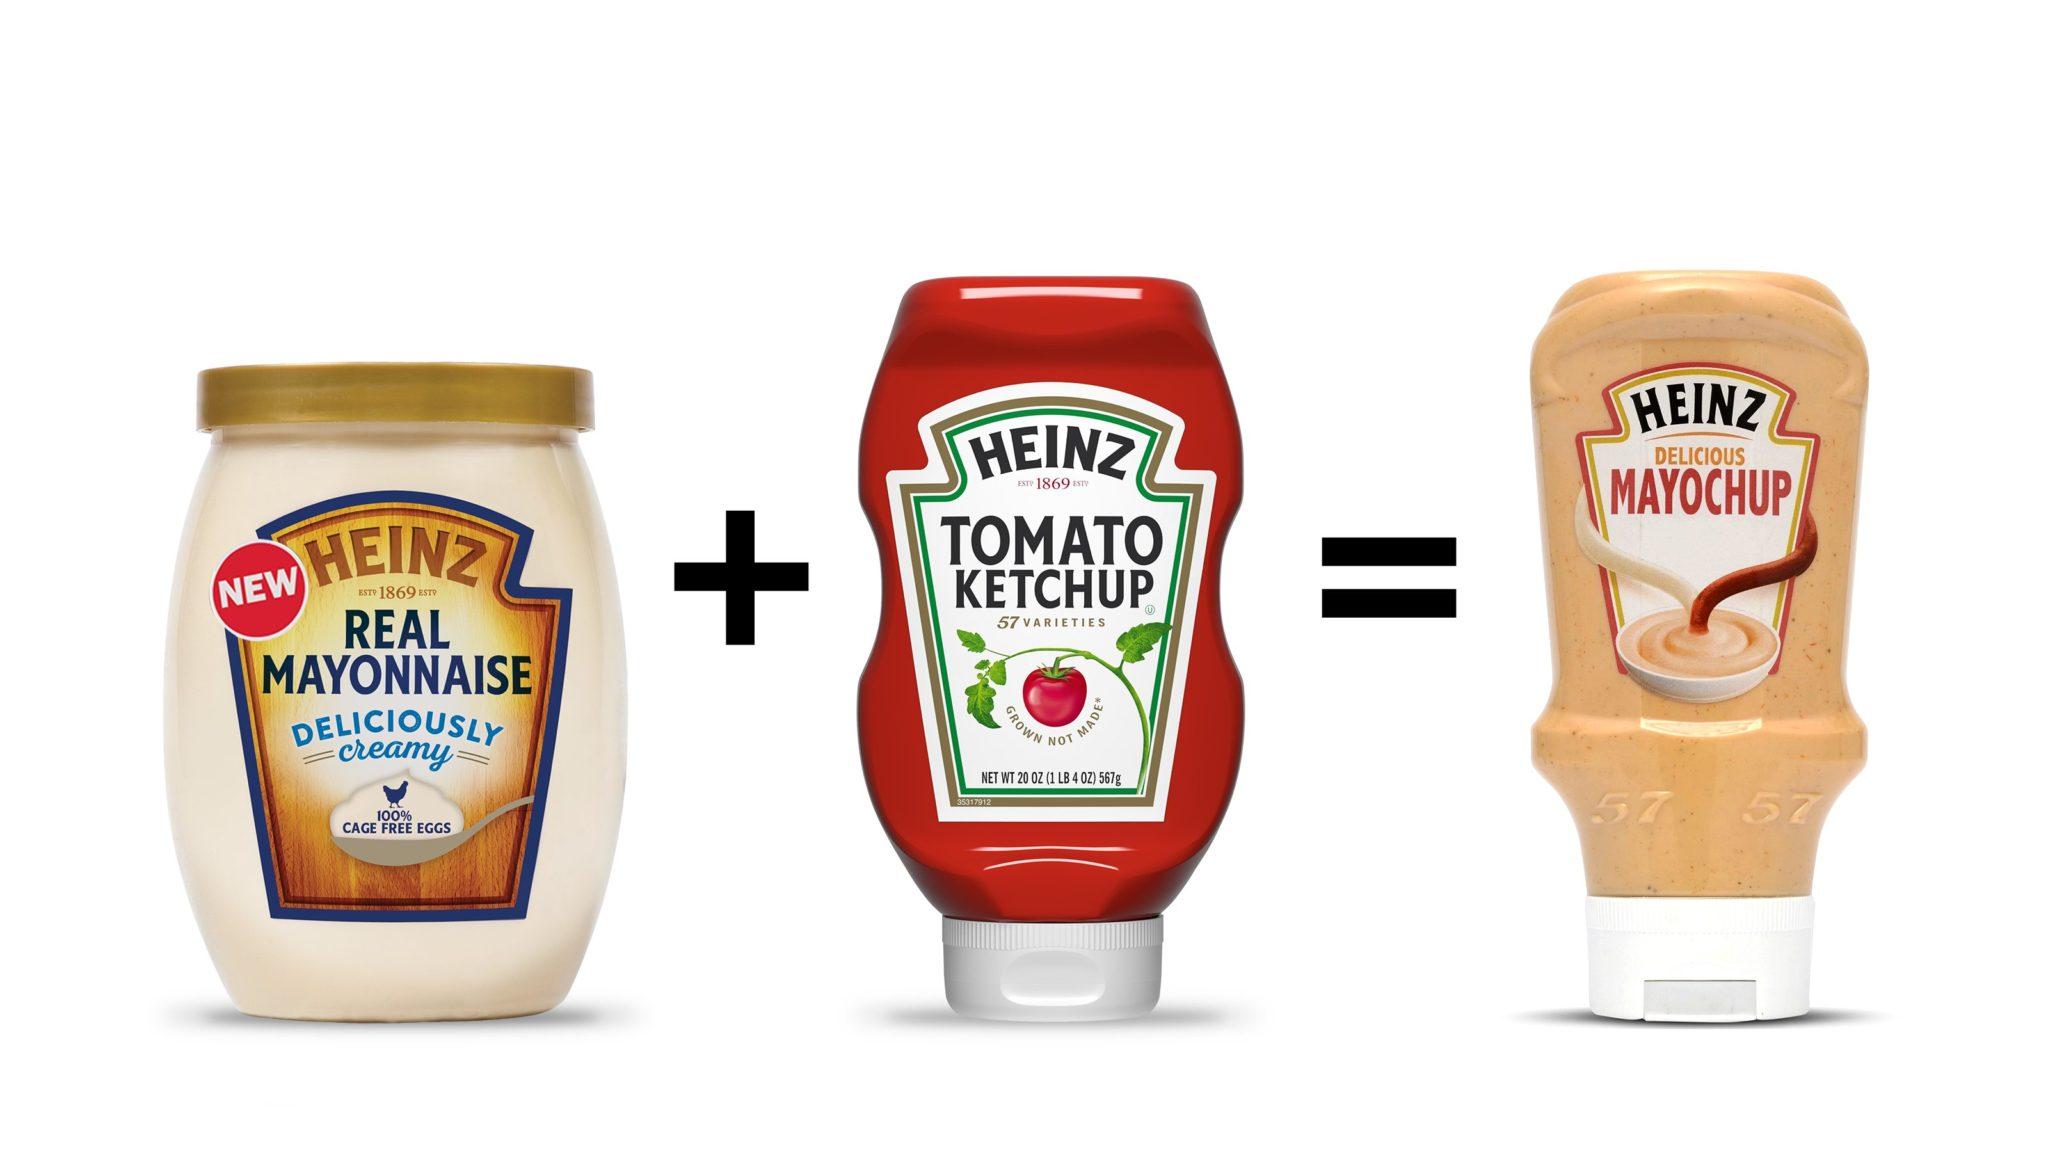 Heinz Combines Ketchup and Mayonnaise to Make Mayochup, Dividing the Internet